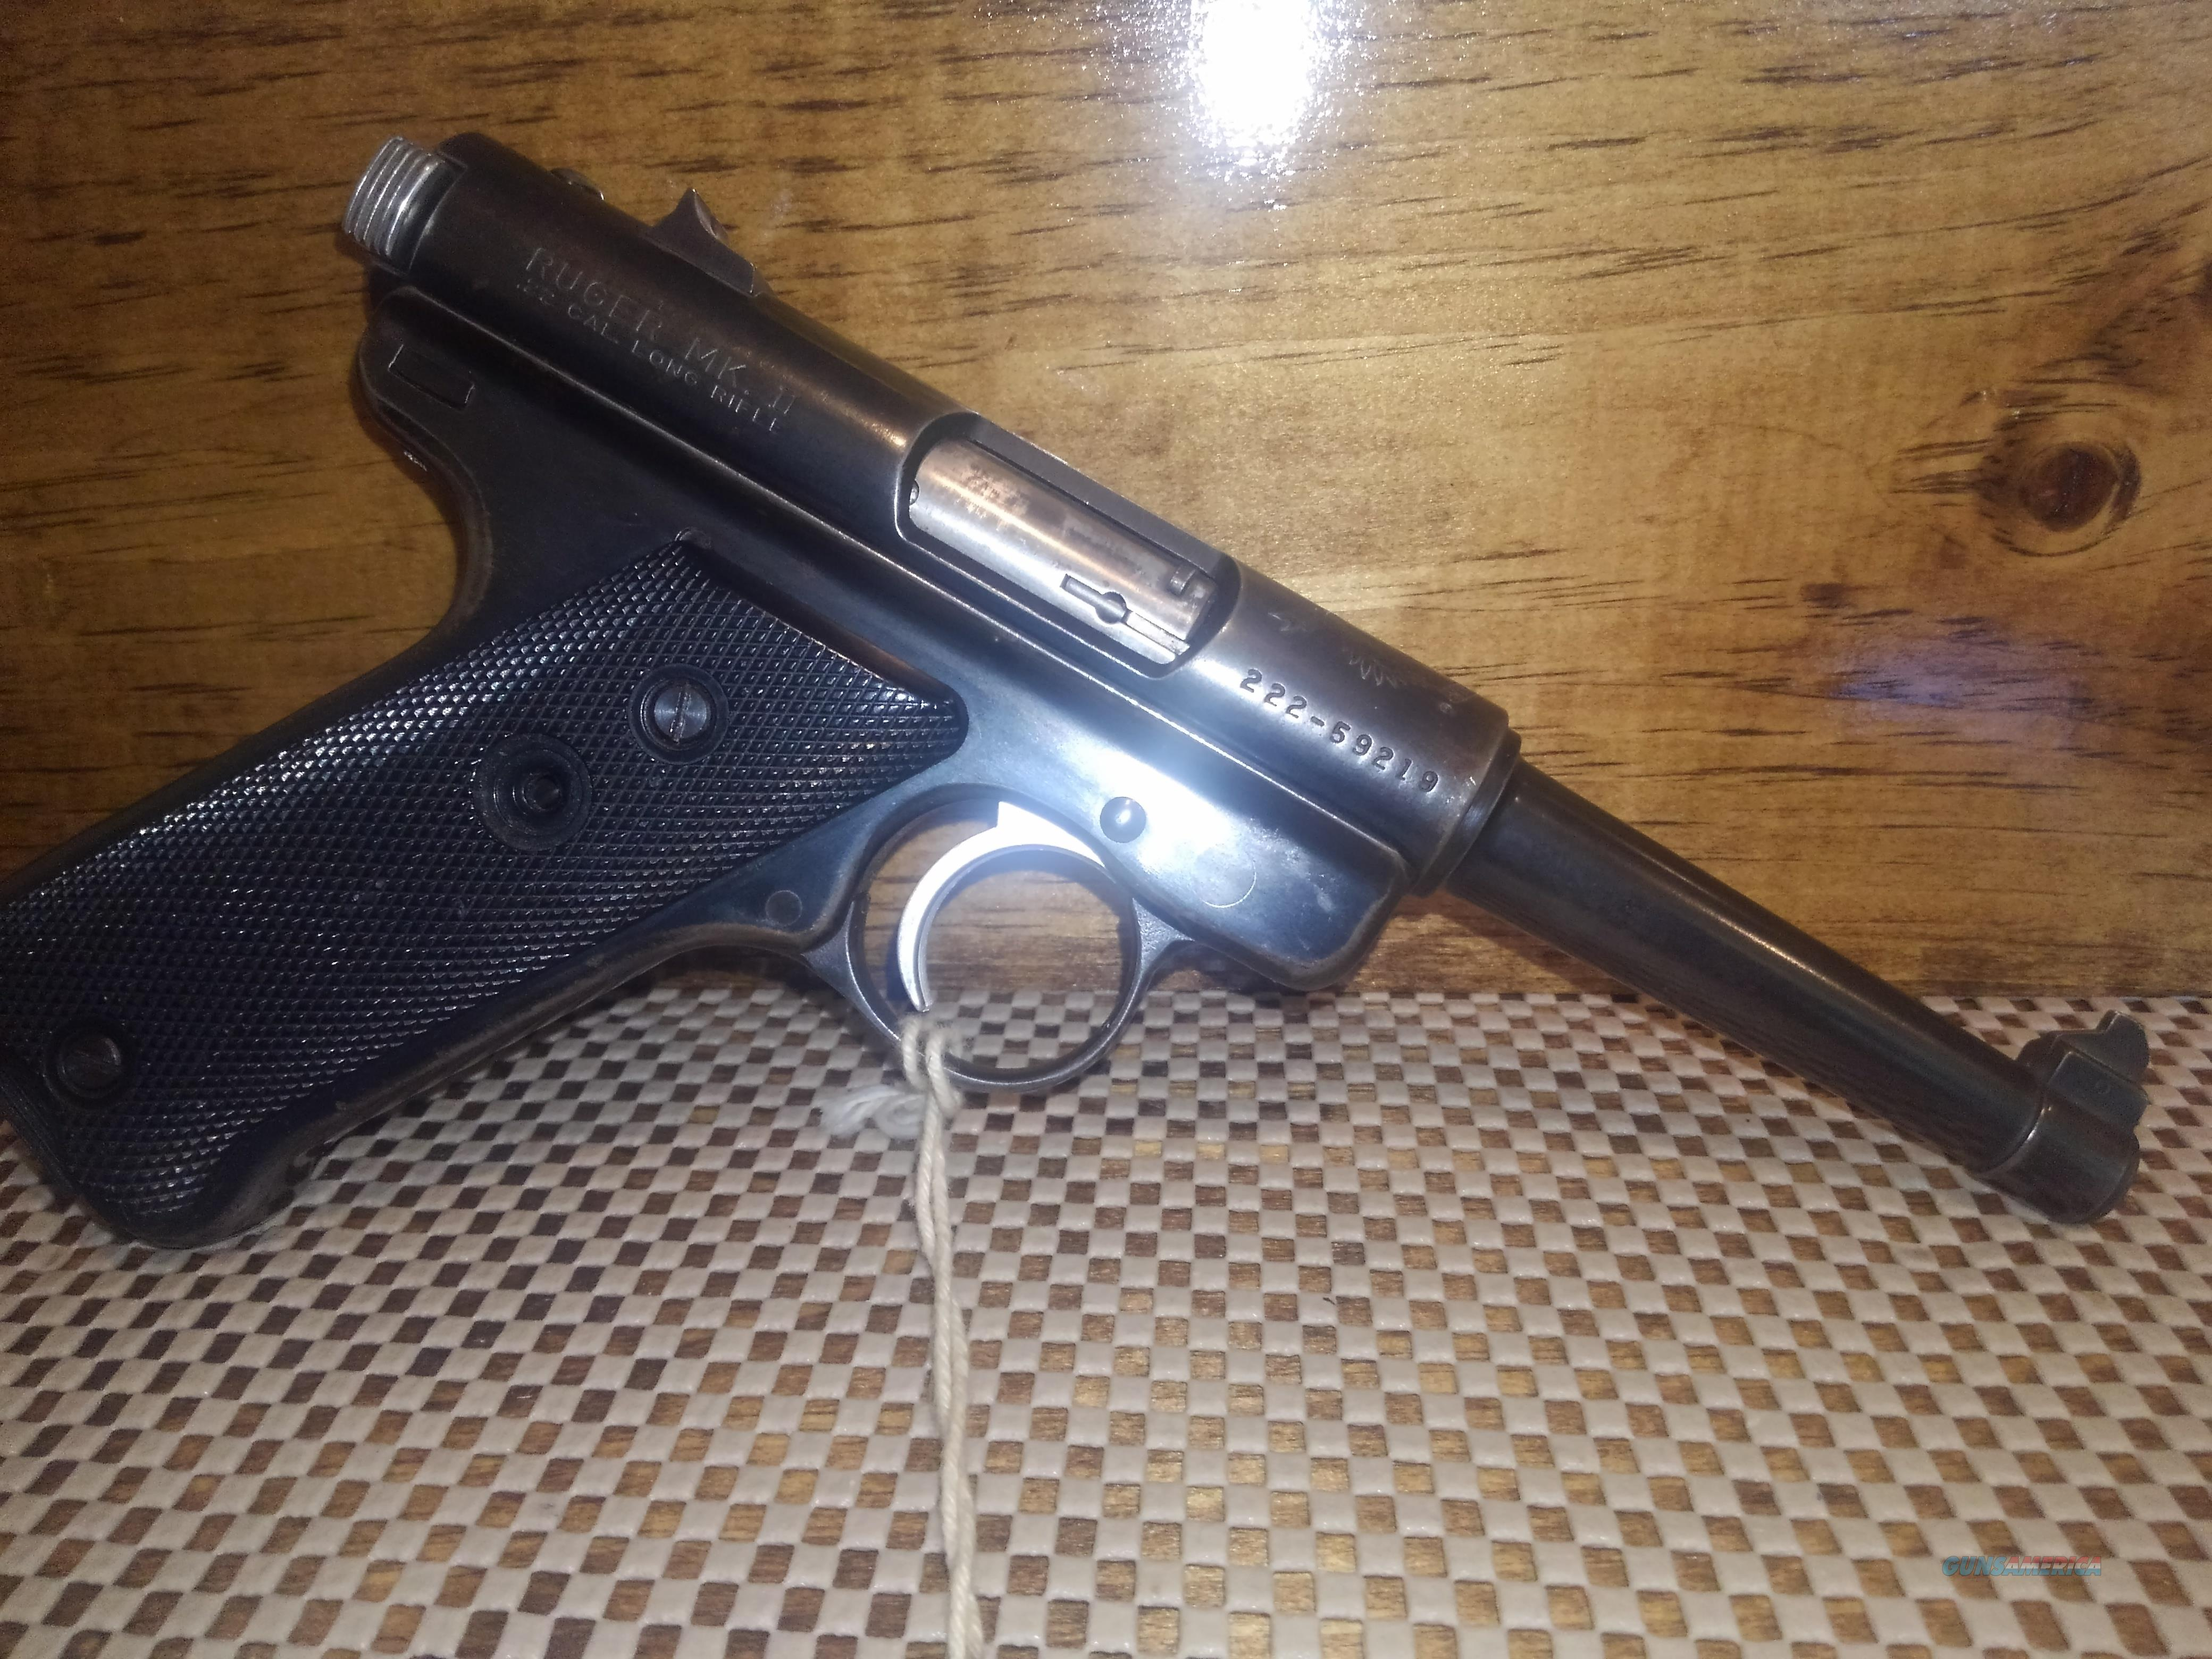 RUGER MKII 50TH ANNIVERSARY, FREE SHIPPING NO CC FEE  Guns > Pistols > Ruger Semi-Auto Pistols > Mark I/II/III/IV Family